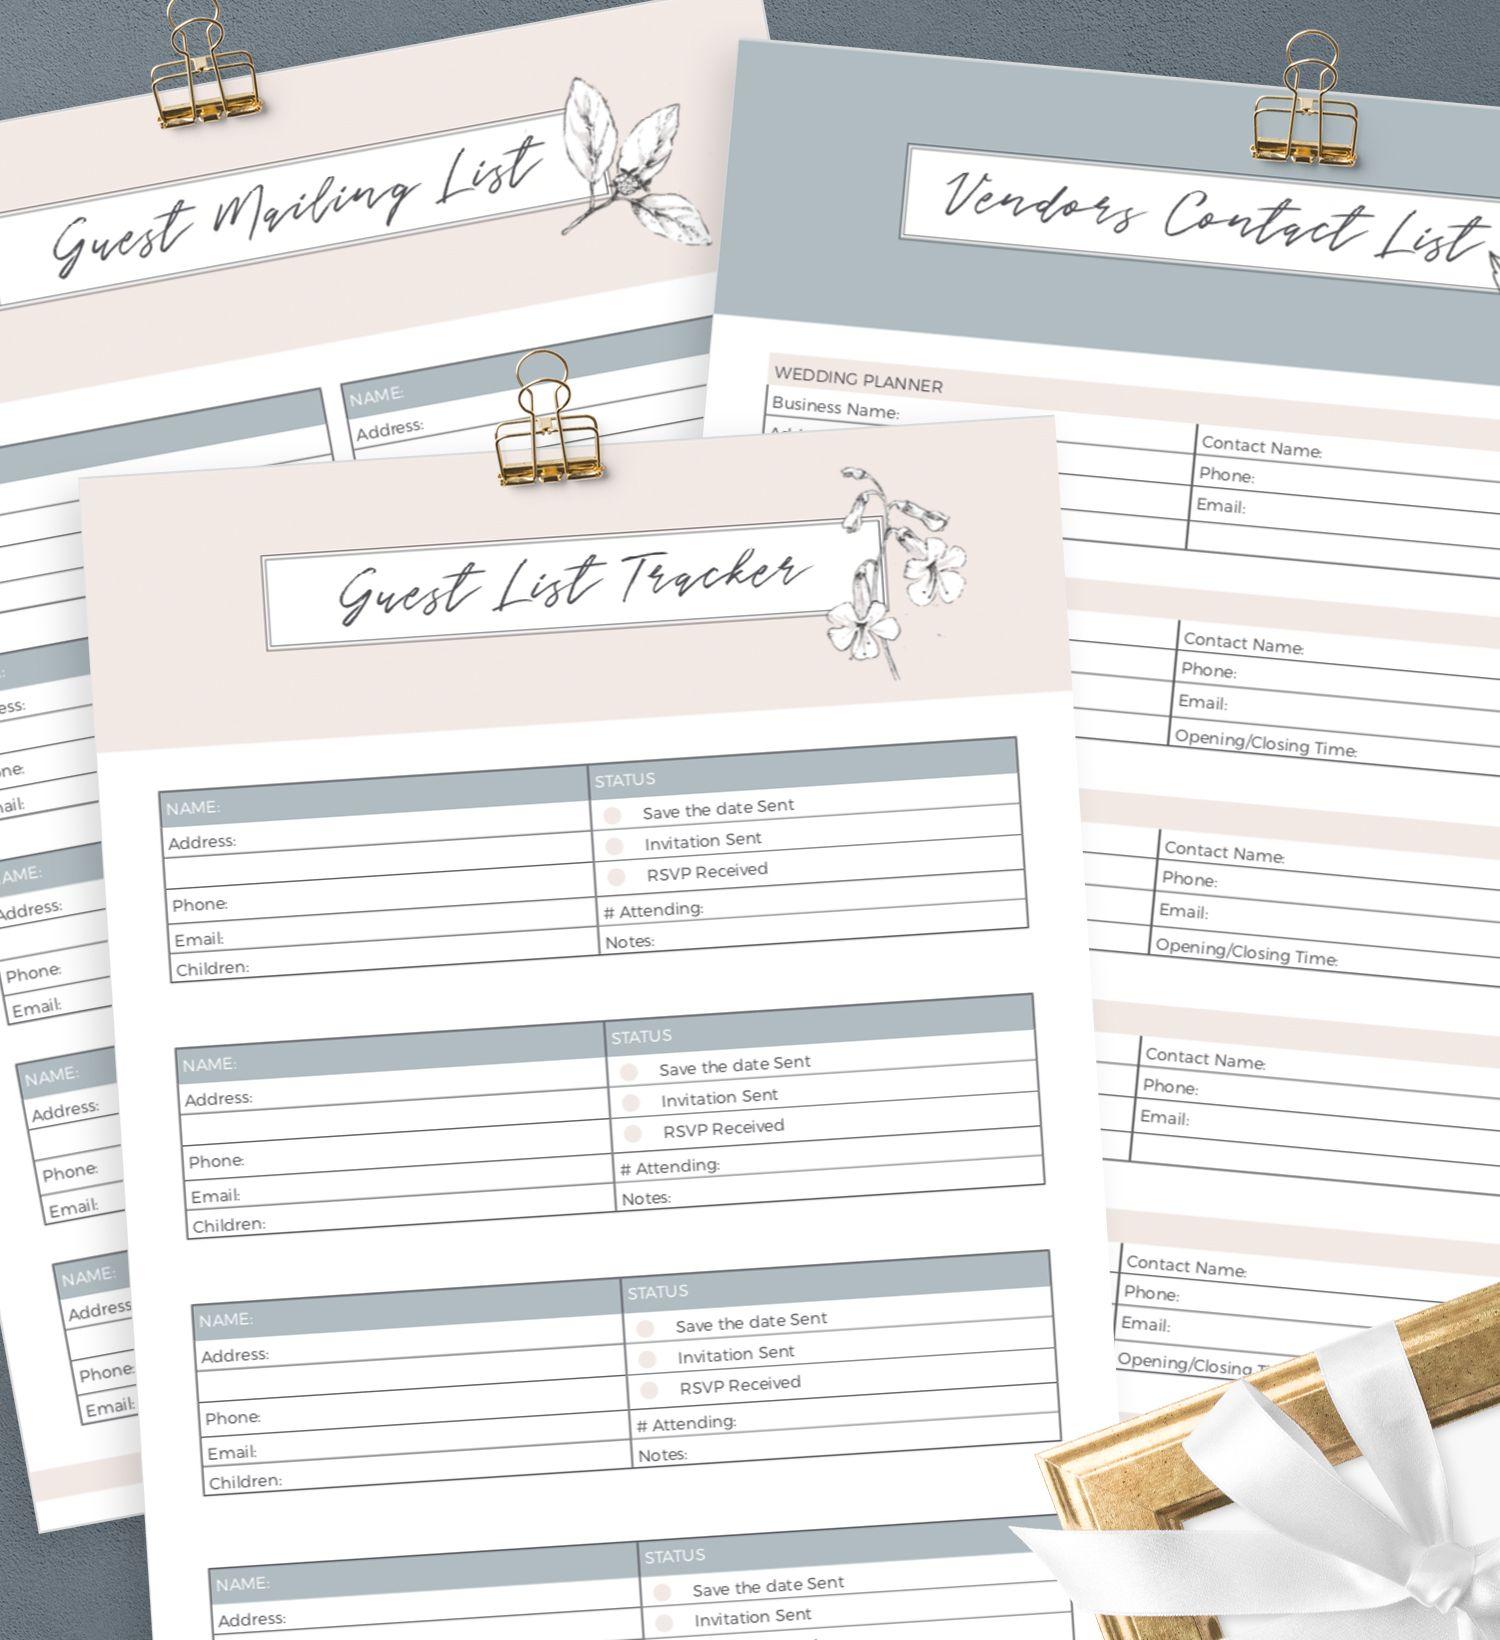 Free Printable Wedding Planner By Creativethings Studio Free Wedding Planner Printables Free Wedding Printables Wedding Planner Printables